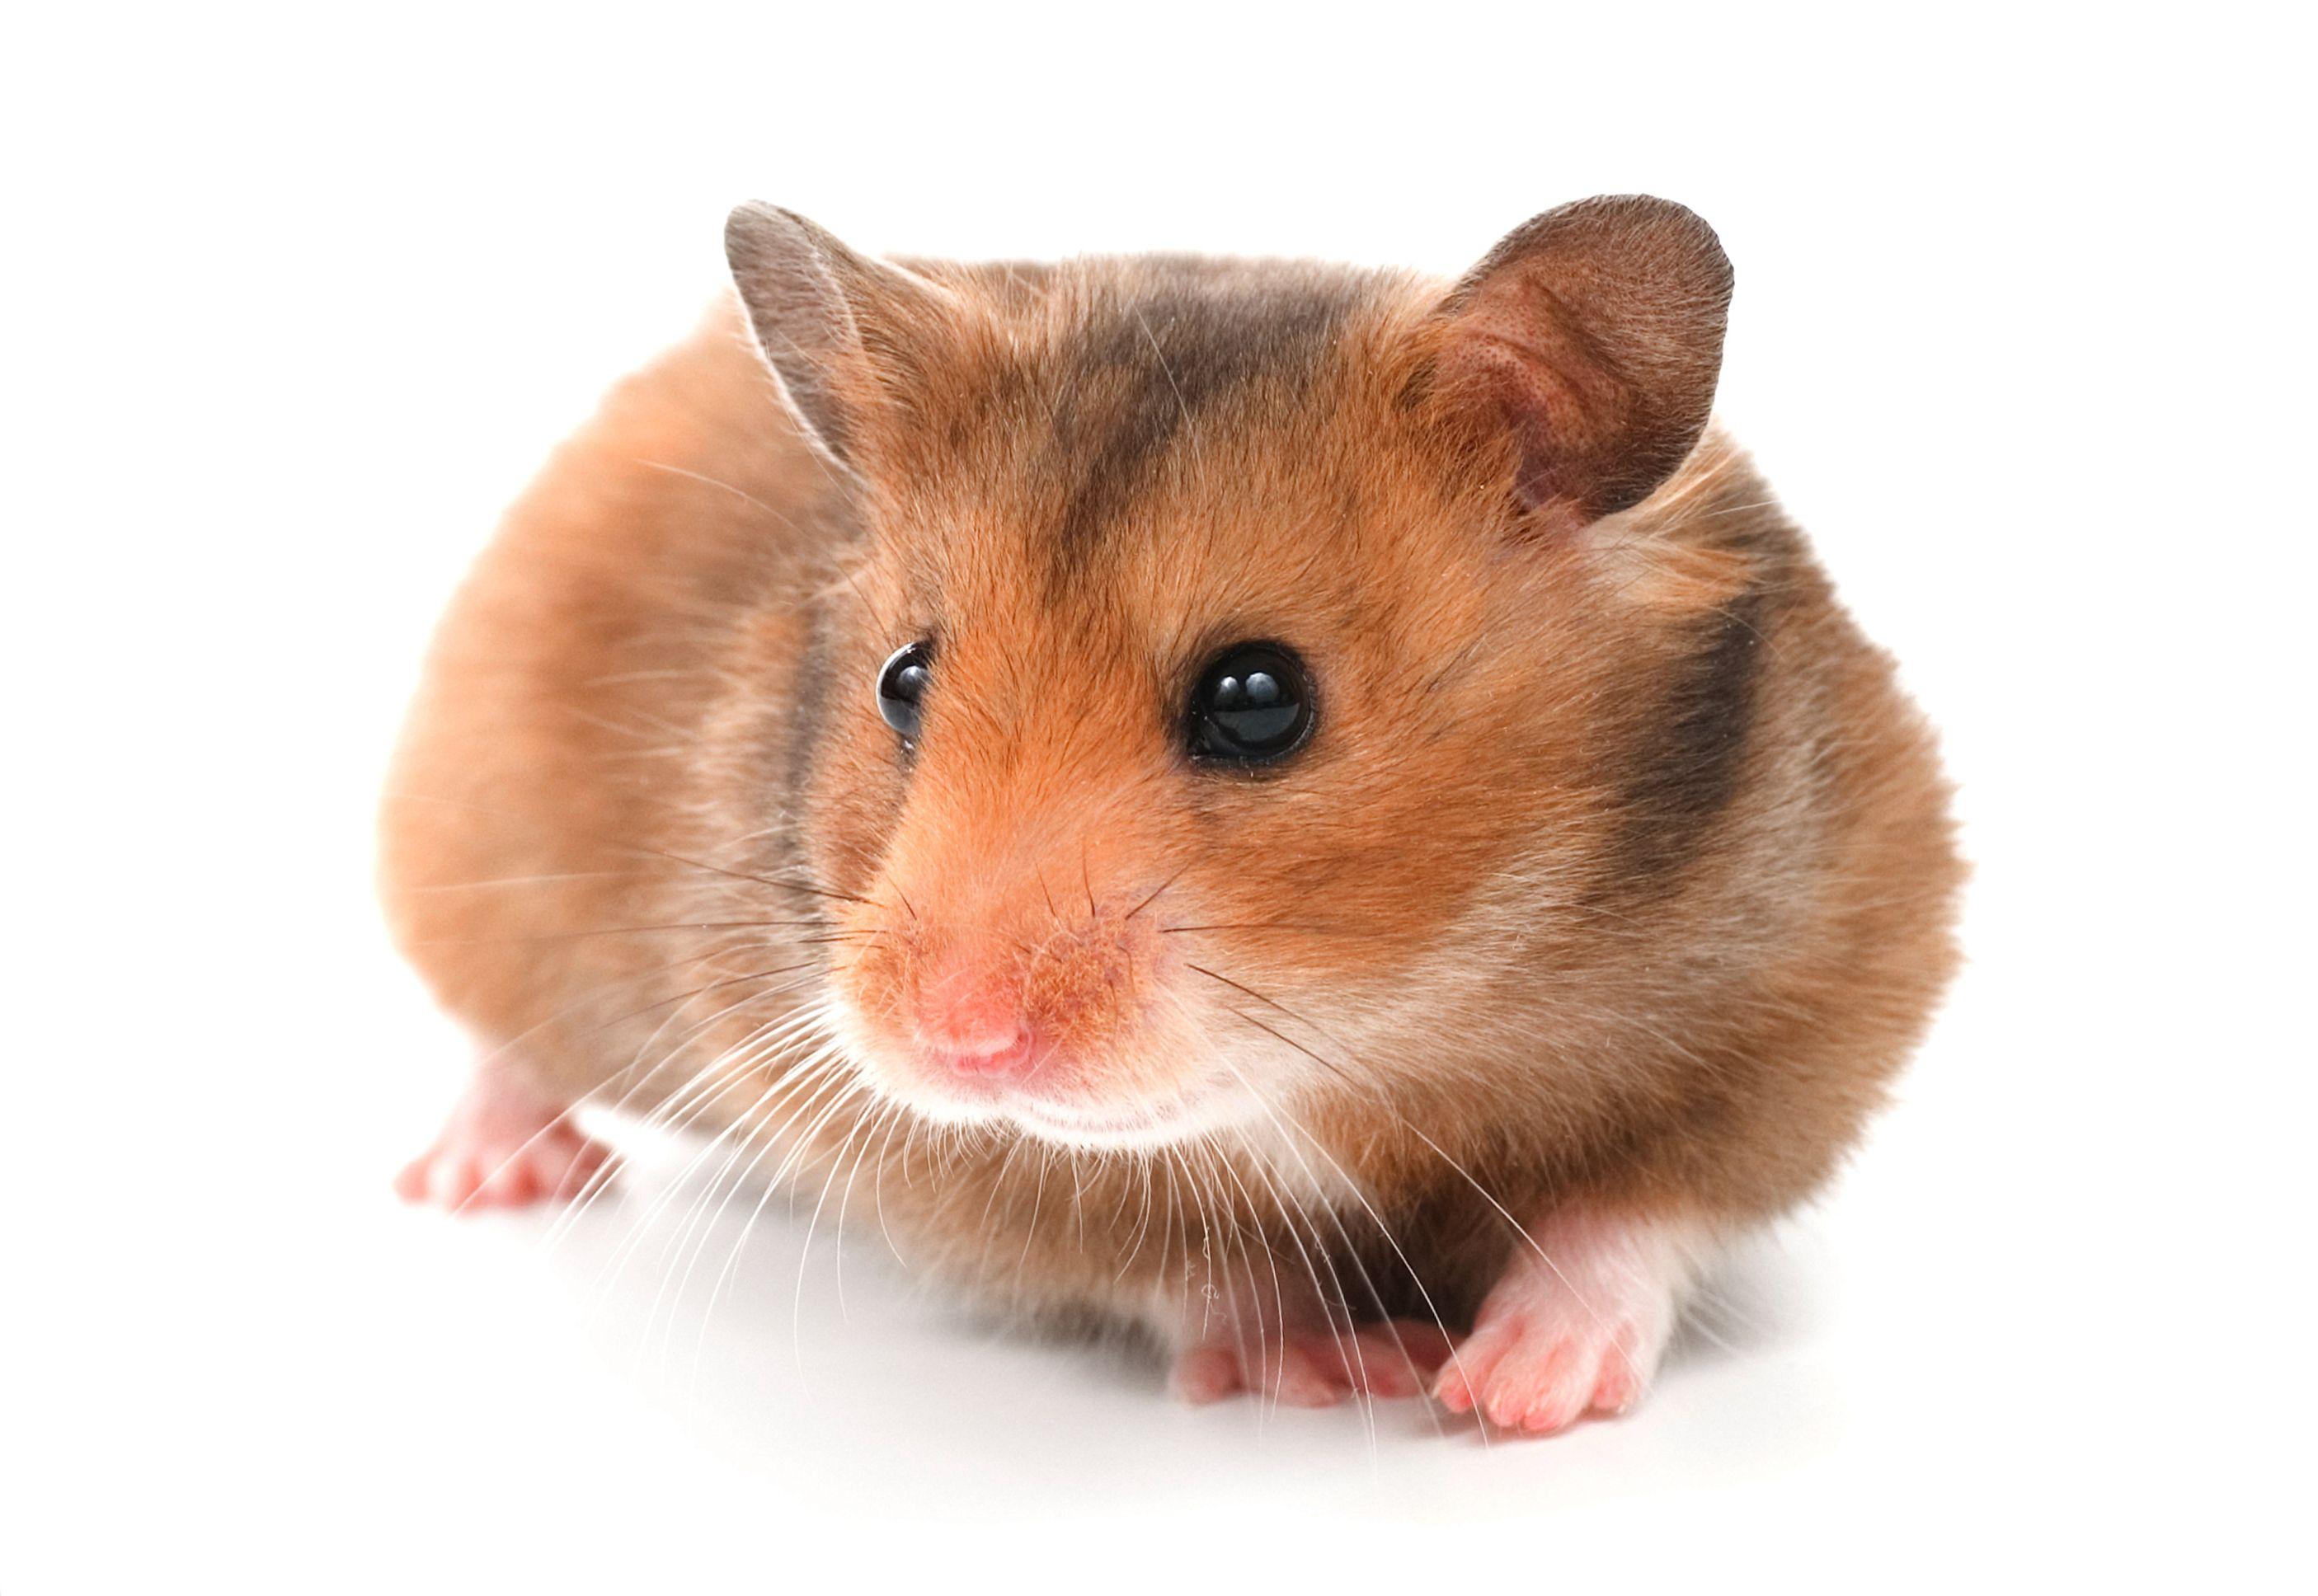 Hamster Breeds Types of Hamsters Bear hamster, Hamster